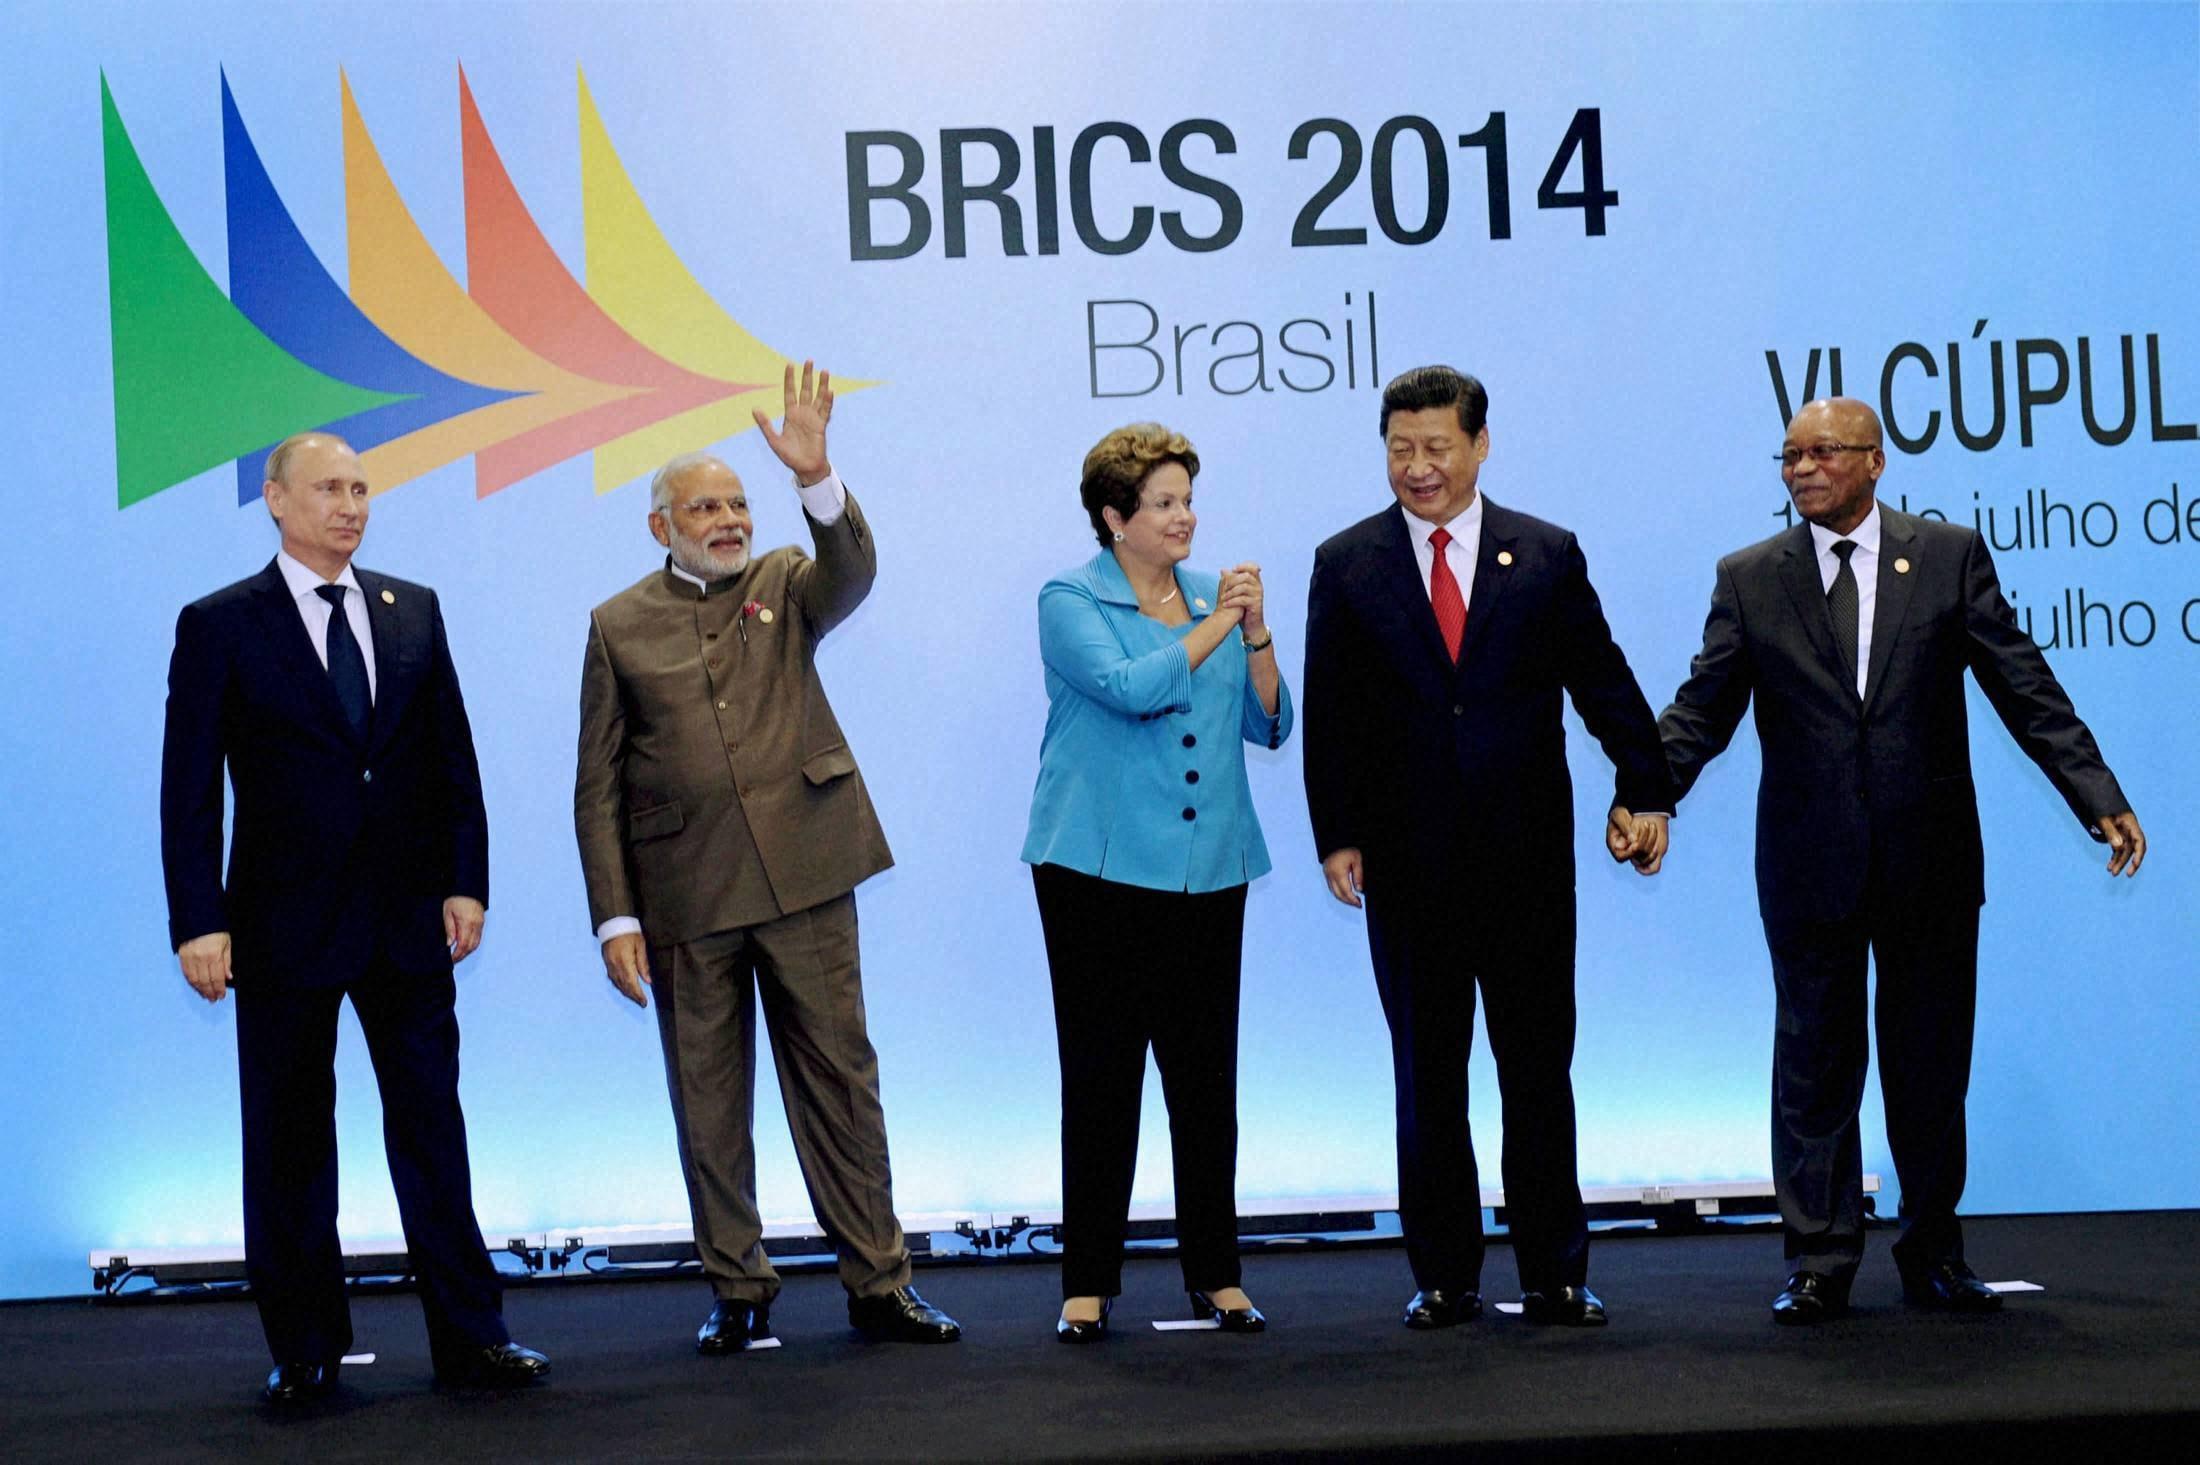 Prime Minister, Narendra Modi, Russian President, Vladimir Putin, Brazilian President, Dilma Rousseff, Chinese President, Xi Jinping, South African, President Jacob Zuma,  6th BRICS summit, Ceara events centre, Fortaleza, Brazil